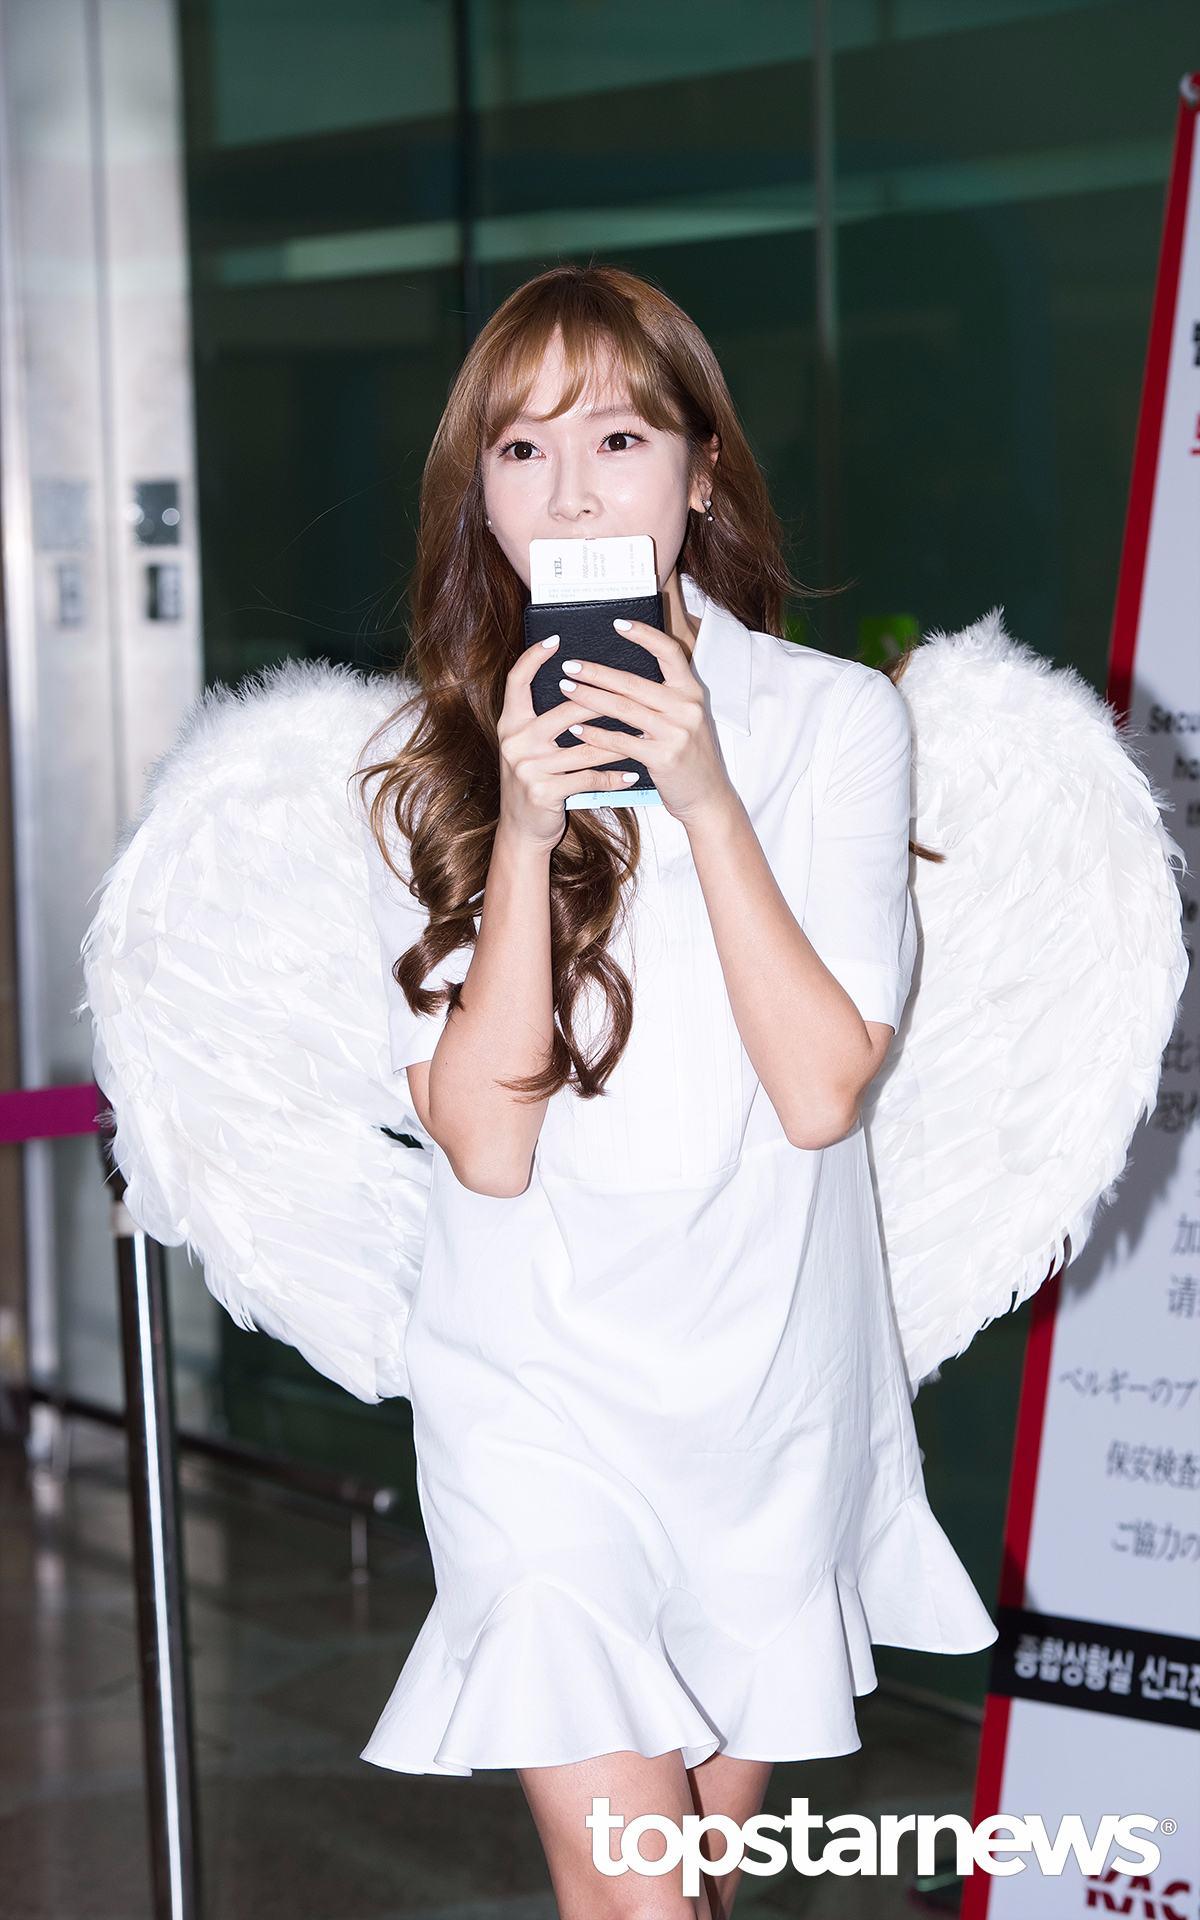 Jessica之所以背著翅膀裝亮相是因為,早前VAPP直播中Jessica曾允諾,若是新歌音源可以拿到一位就會在前往中國的時候帶著翅膀亮相機場。